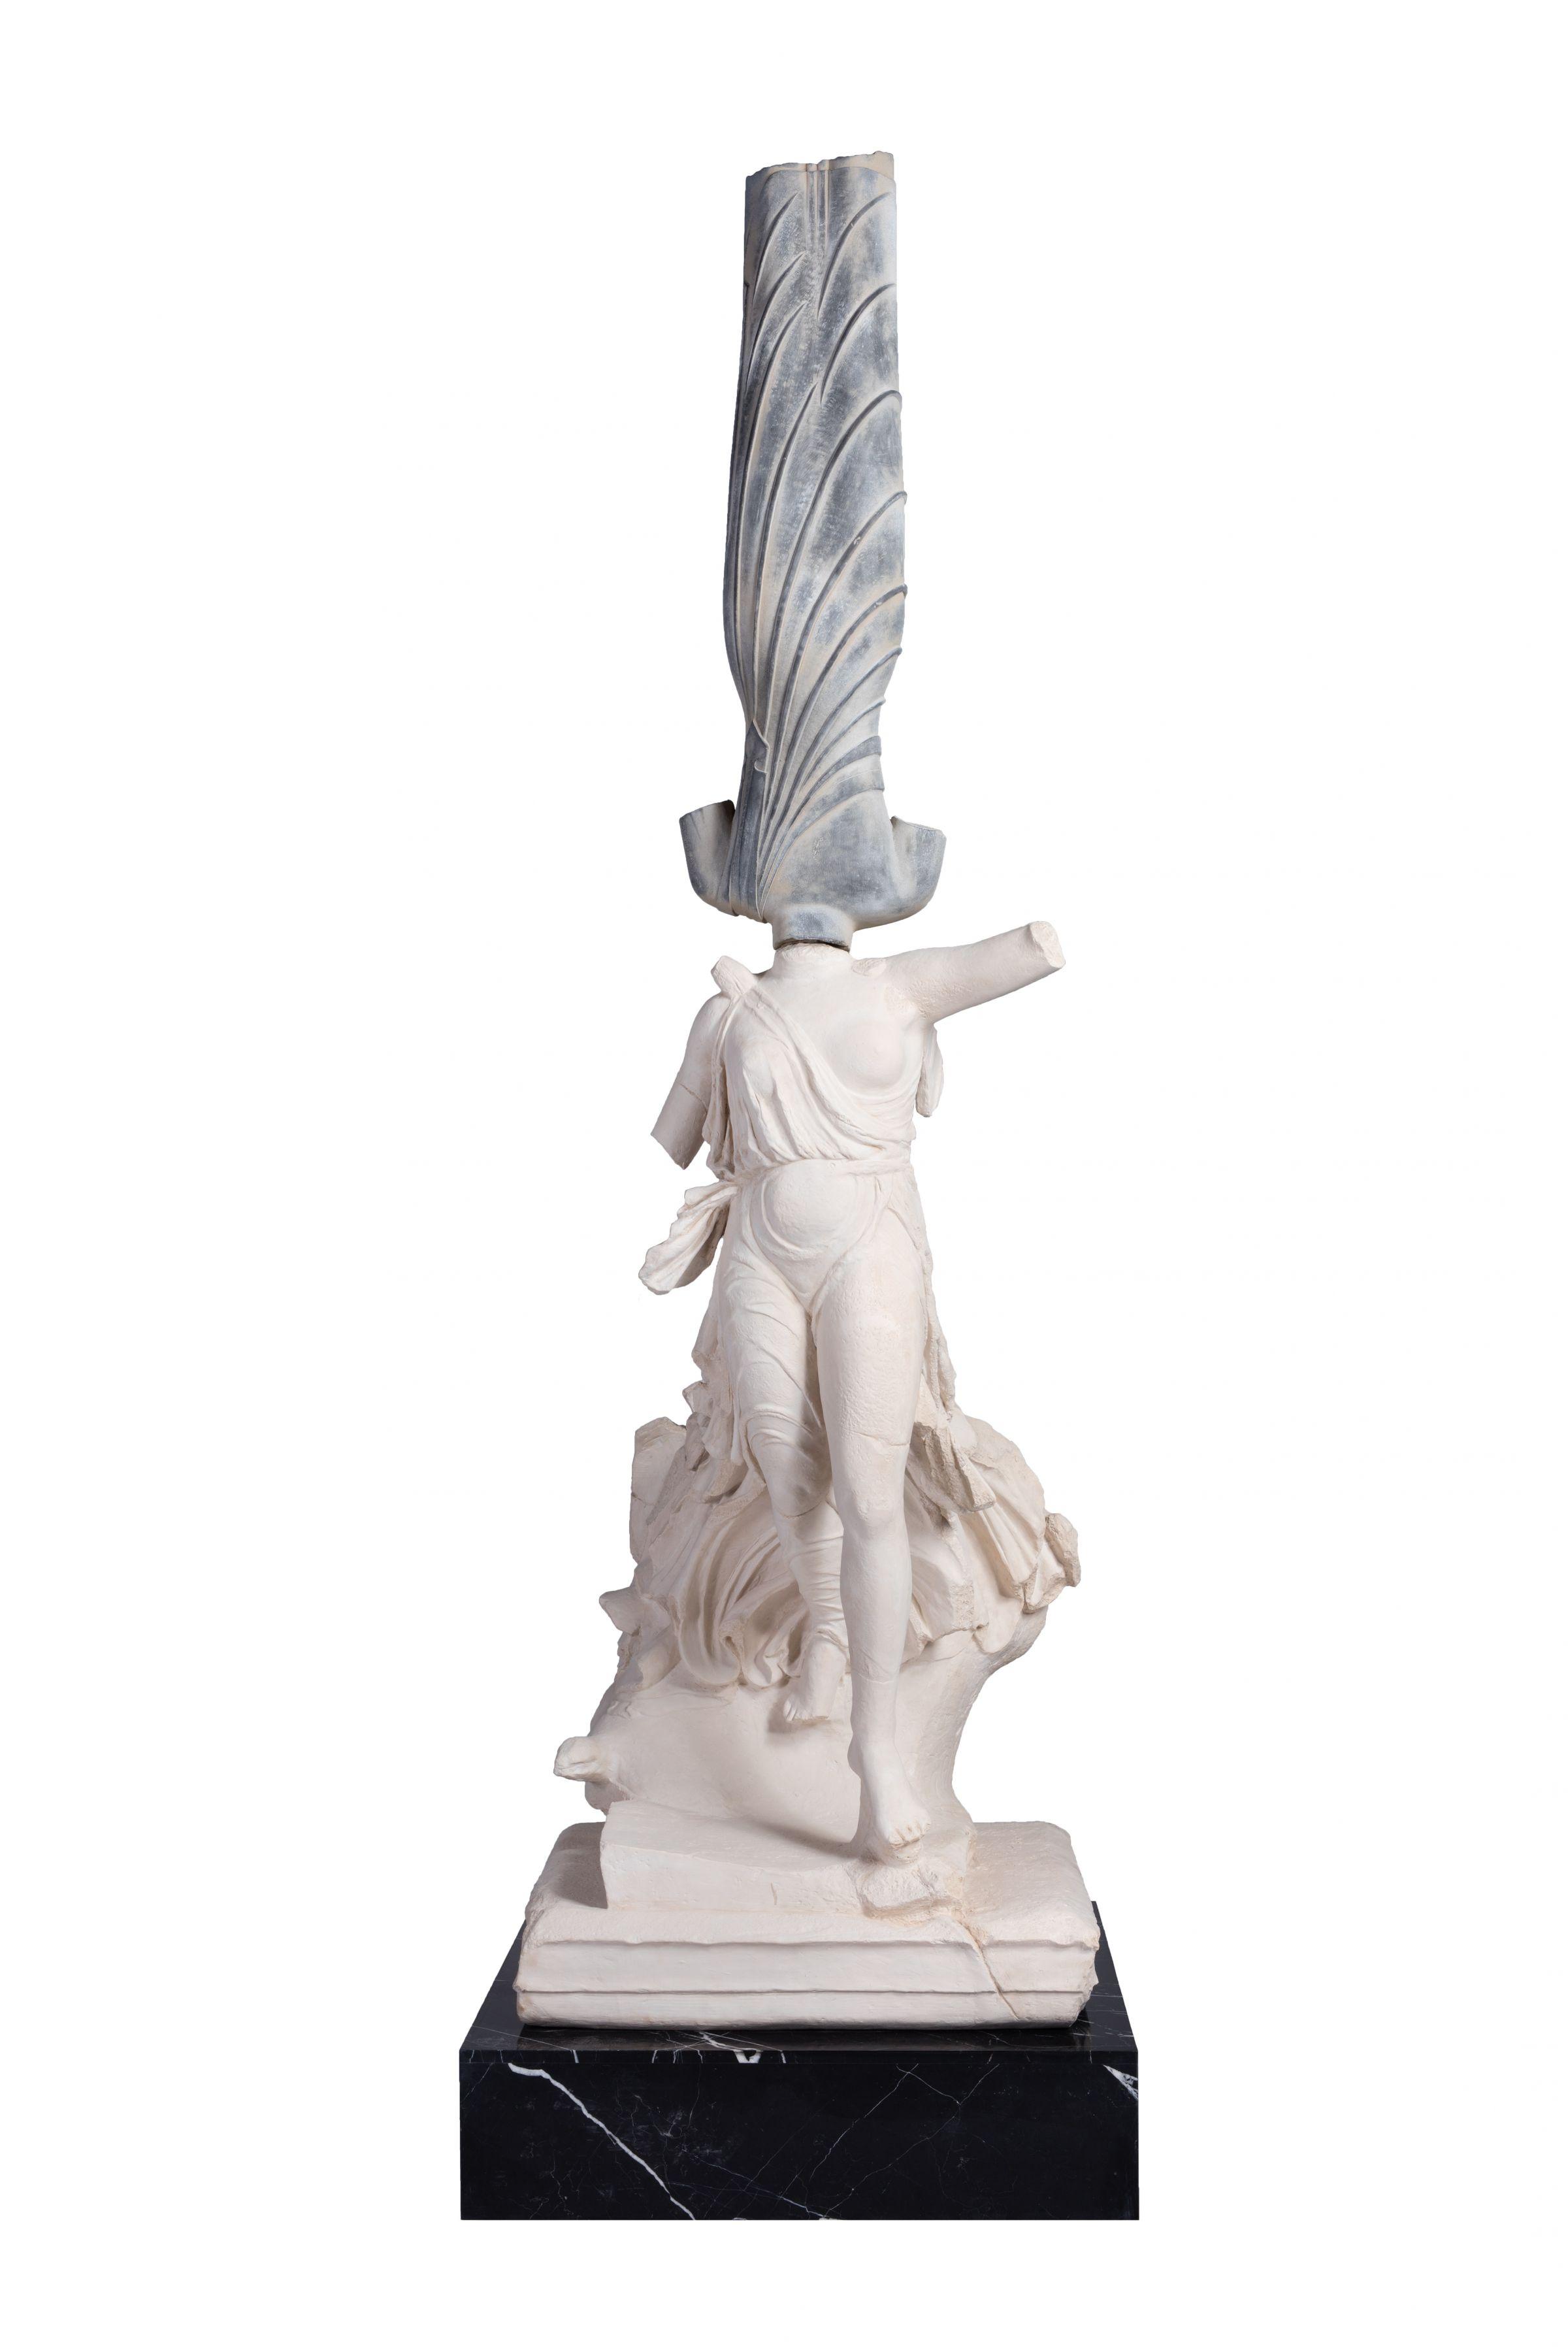 XU ZHEN Eternity - Standing Bodhisattva, Statue of Nike of Paionios